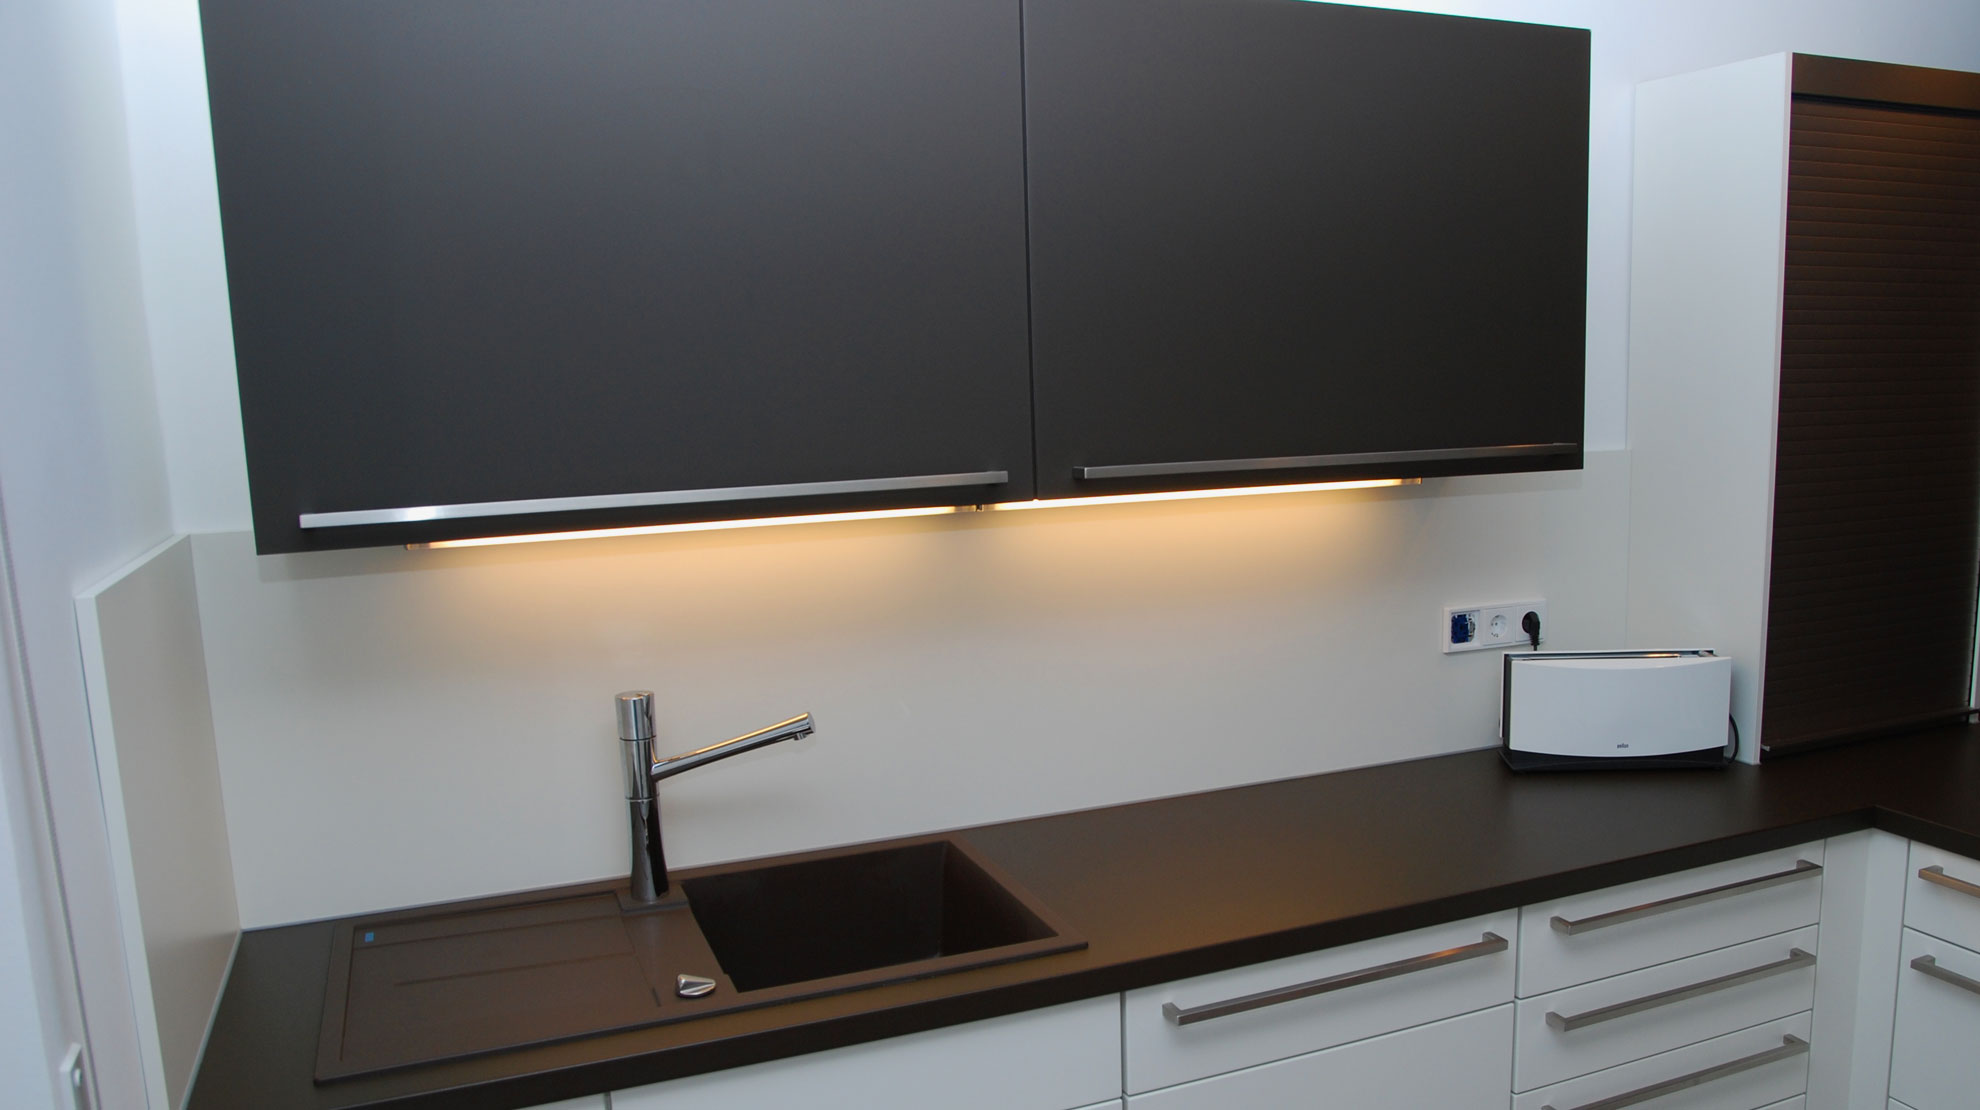 bersicht ts montagebau. Black Bedroom Furniture Sets. Home Design Ideas